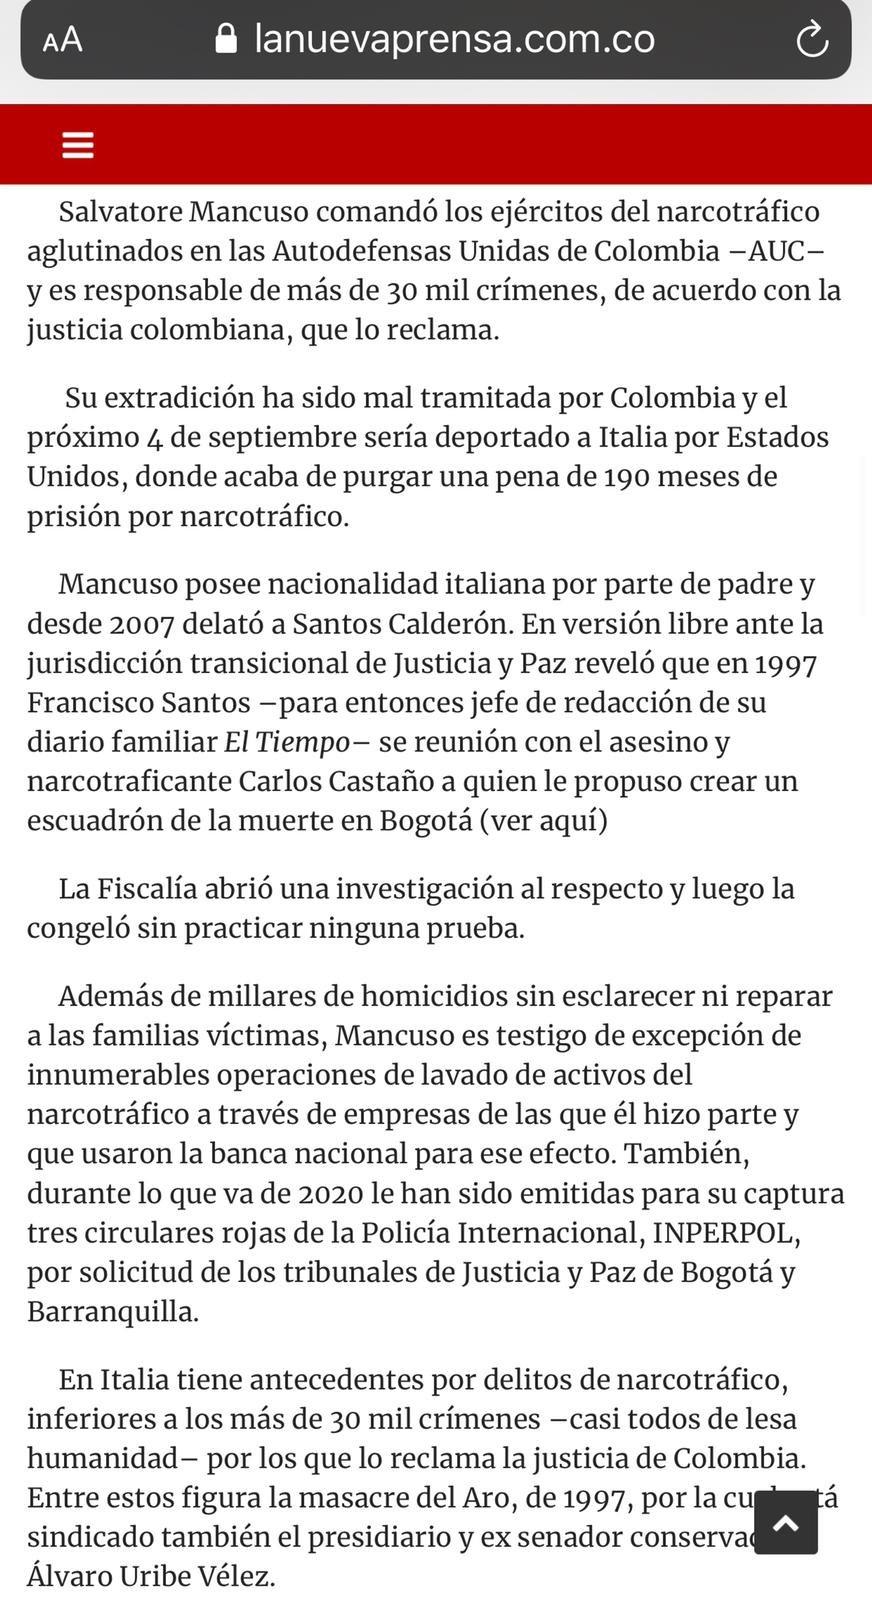 Noticias y  Generalidades - Página 10 EgWo6i7WkAAes7s?format=jpg&name=large